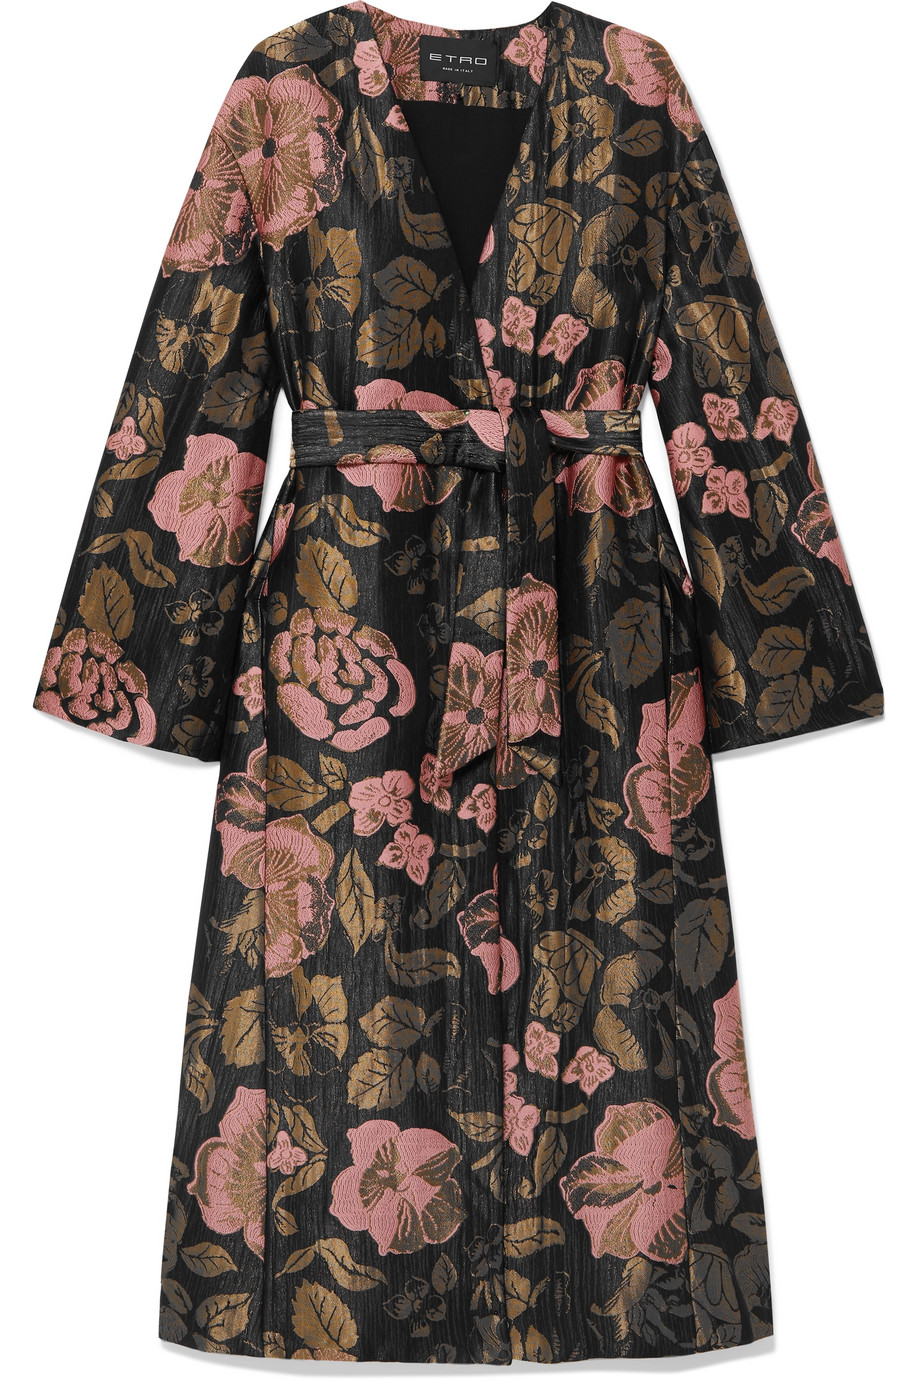 ETRO Belted metallic jacquard coat, £2,120